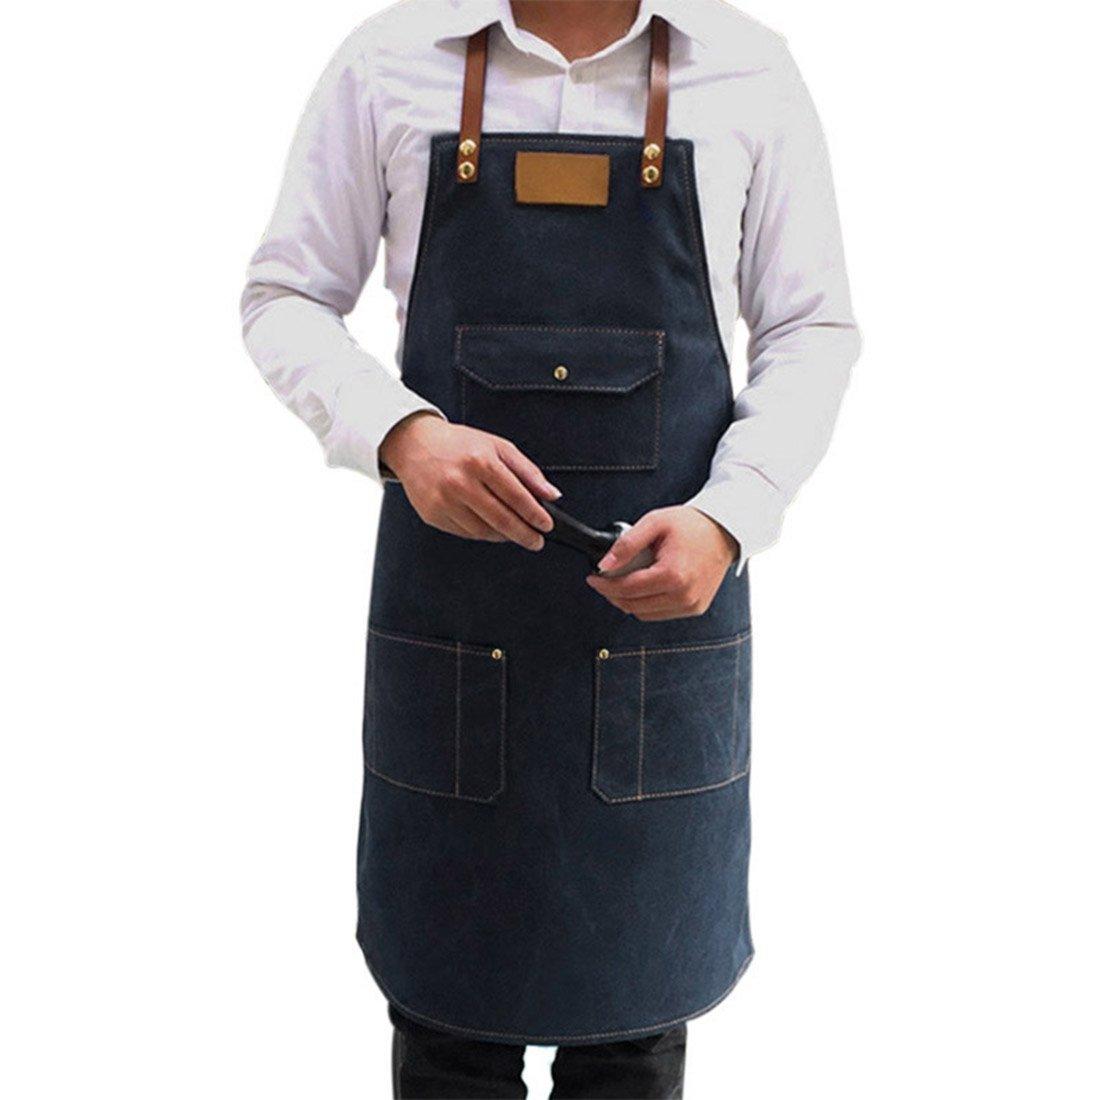 Jiyaru Chef Adjustable Denim Bib Apron with Pockets Kitchen Cooking Workwear for Men Women